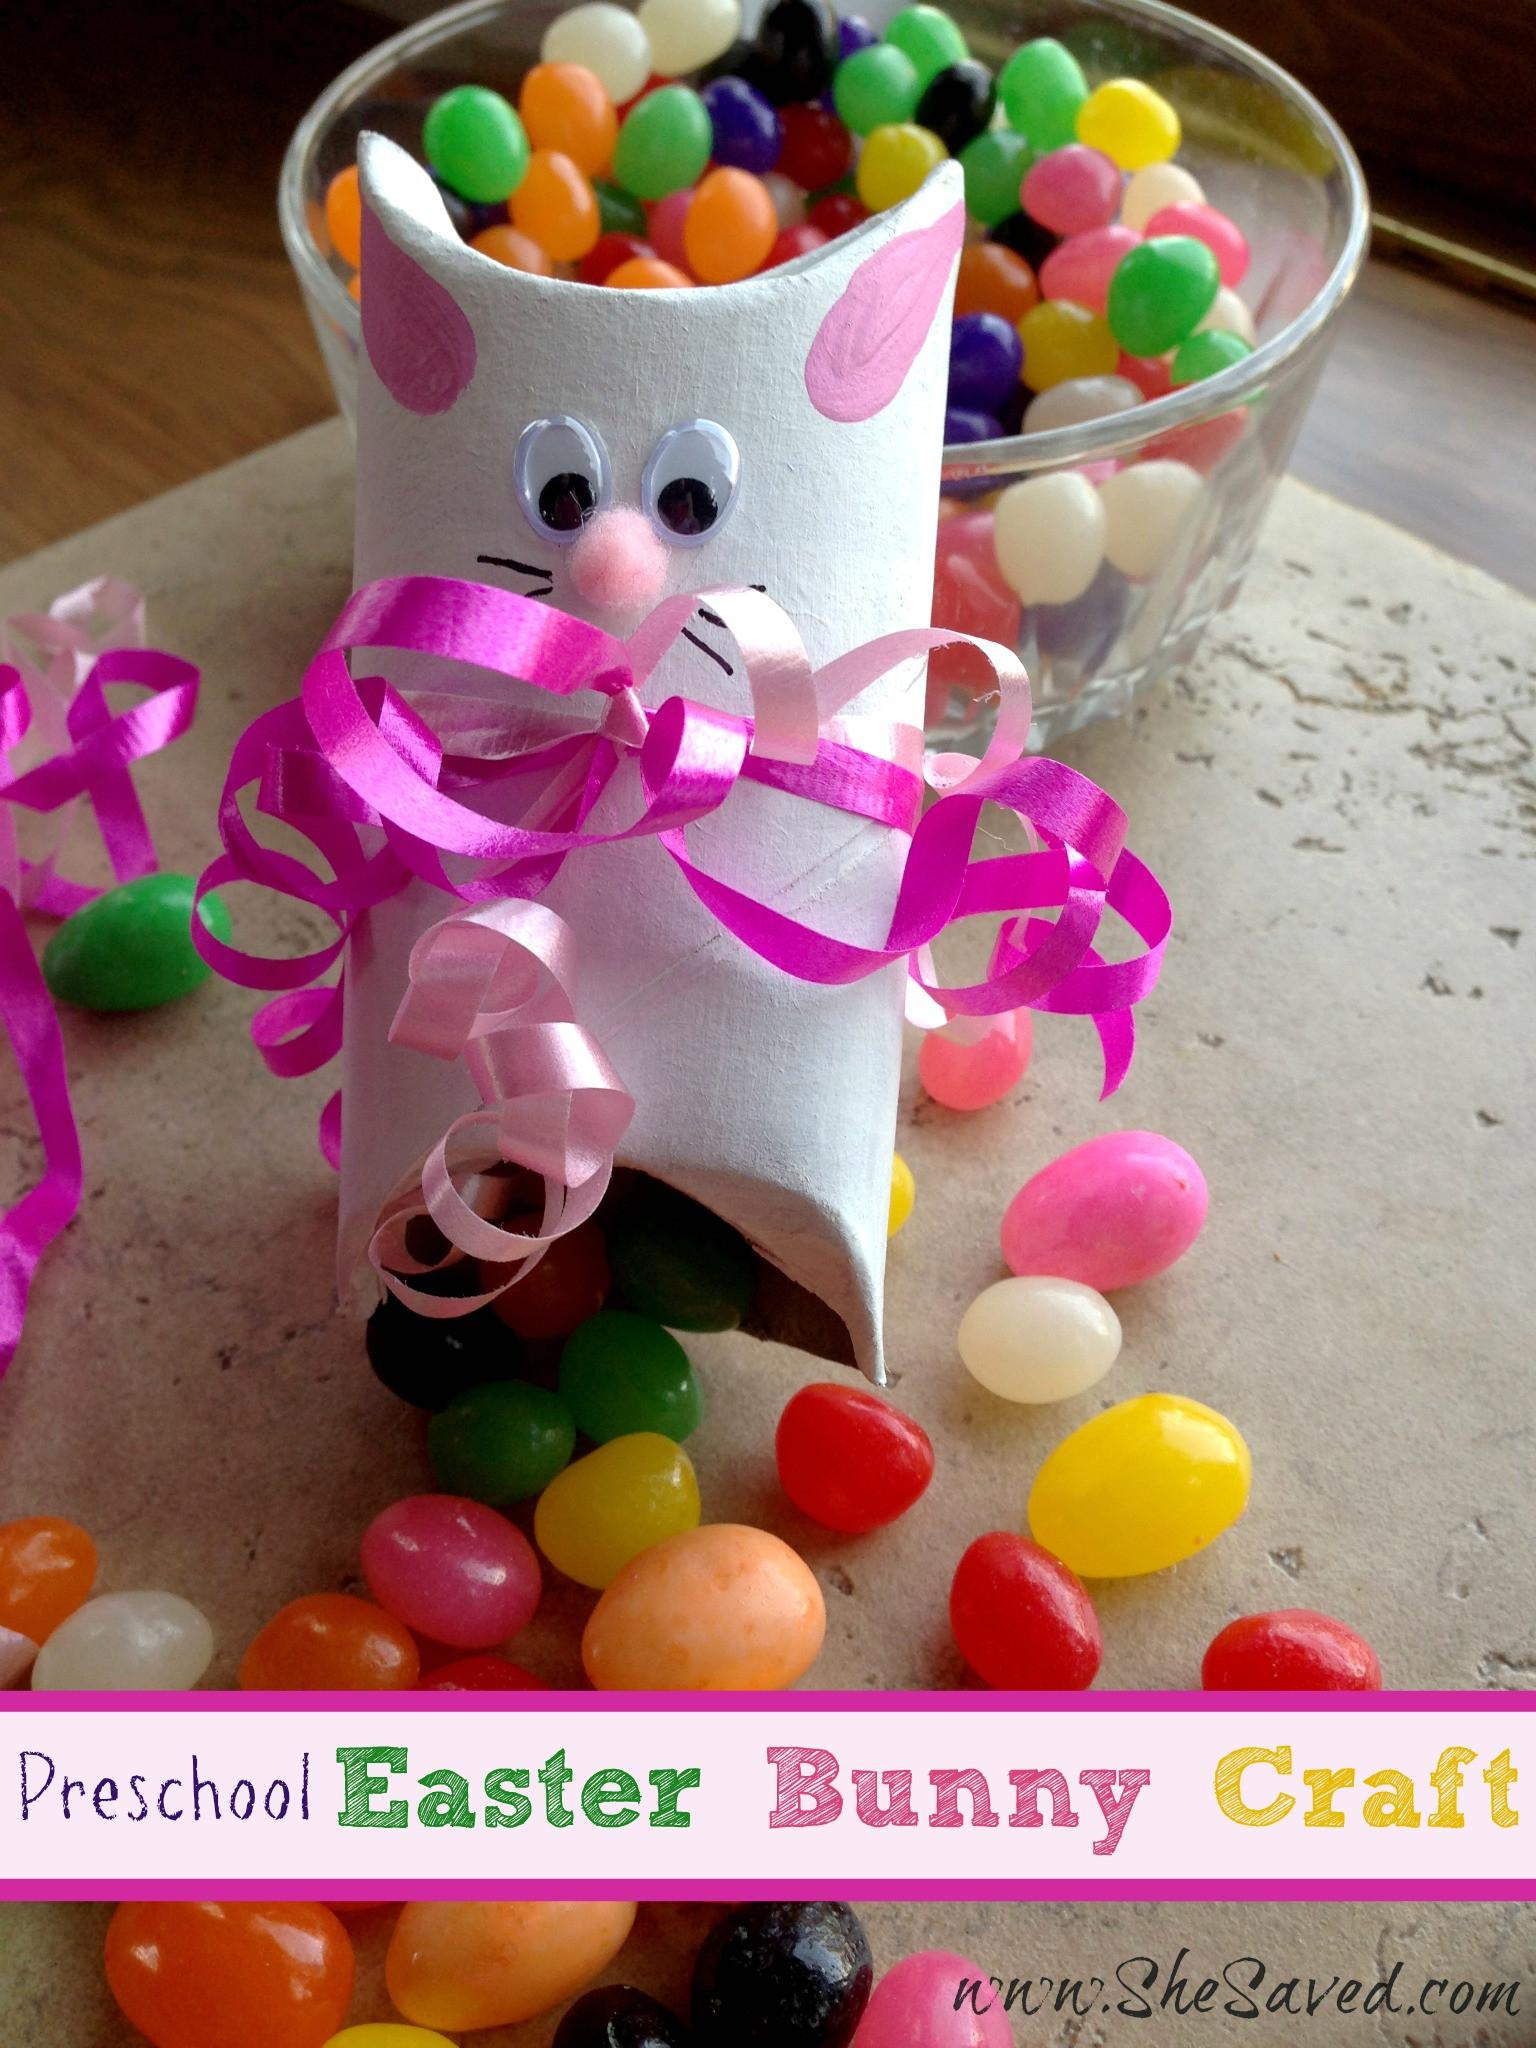 Kindergarten Easter Party Ideas  Preschool Easter Bunny Crafts SheSaved